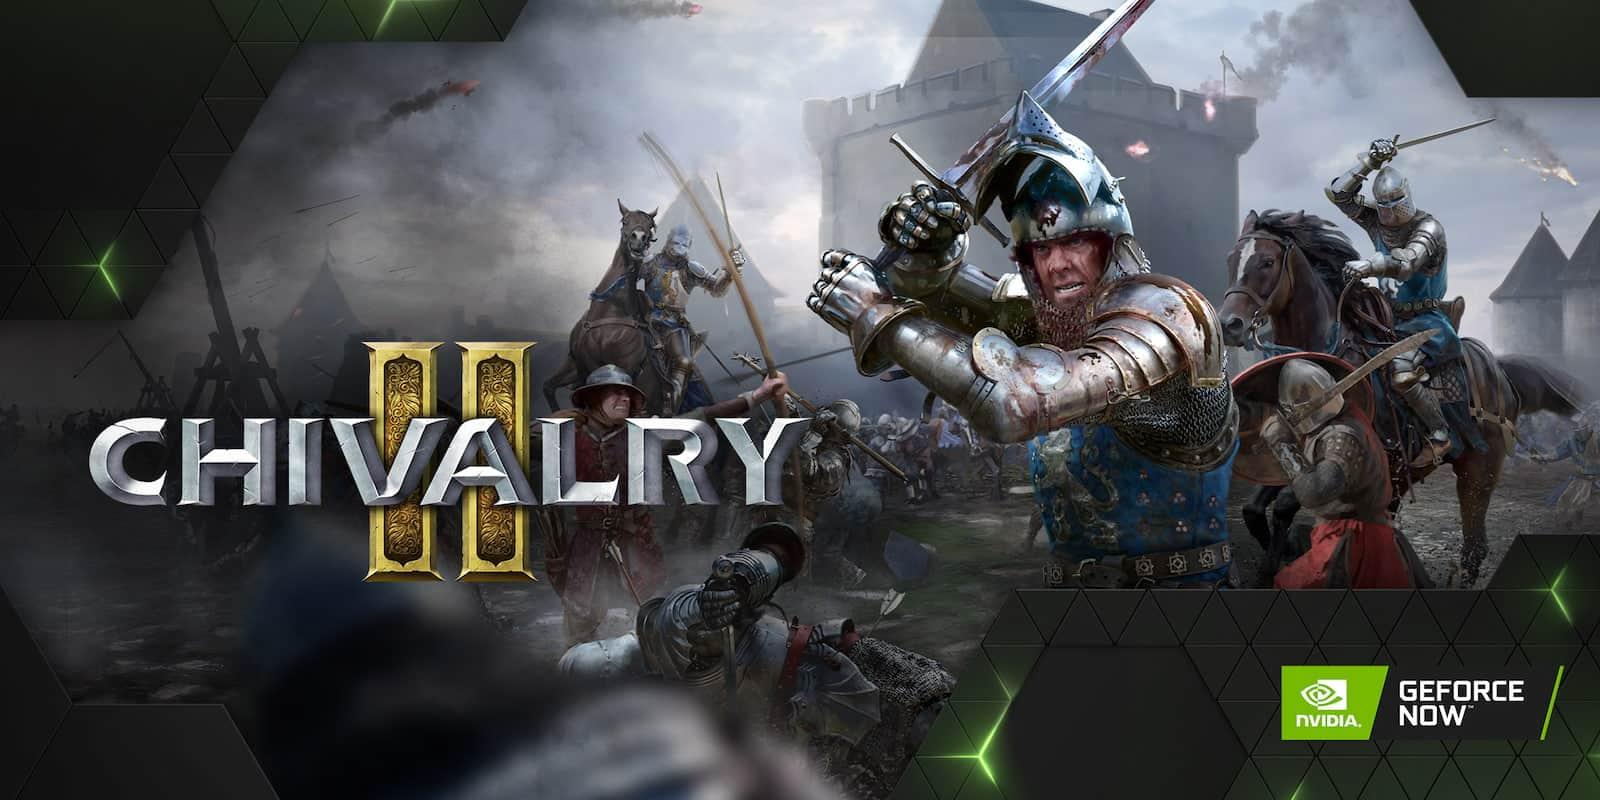 GeForce NOW E3 Chivalry 2